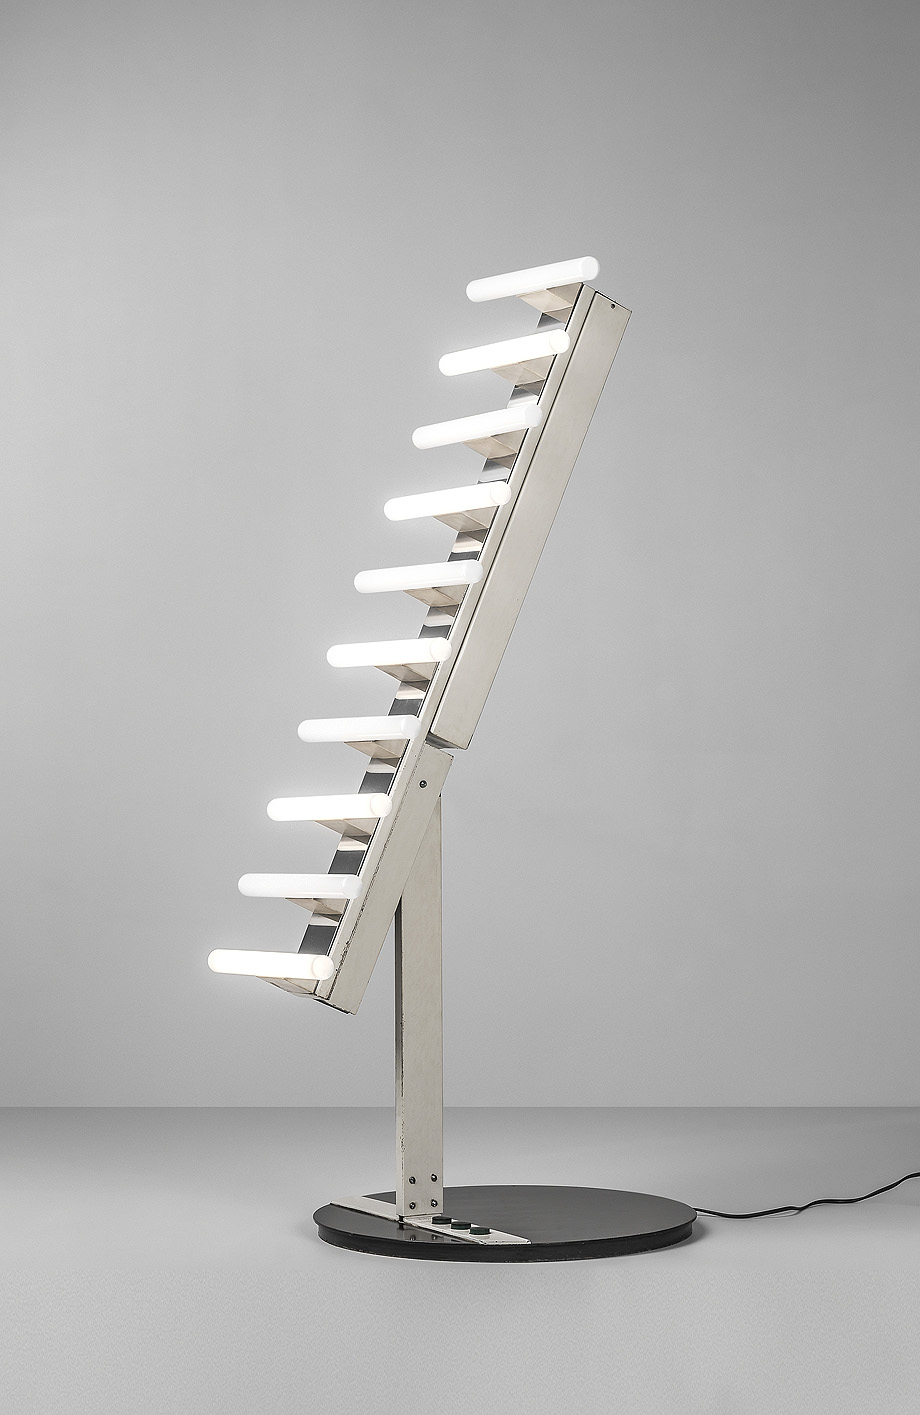 2. Lámpara de pie Alfama (1976), de Estudio IDP (Interiors Disseny Pau, 1973-1983)